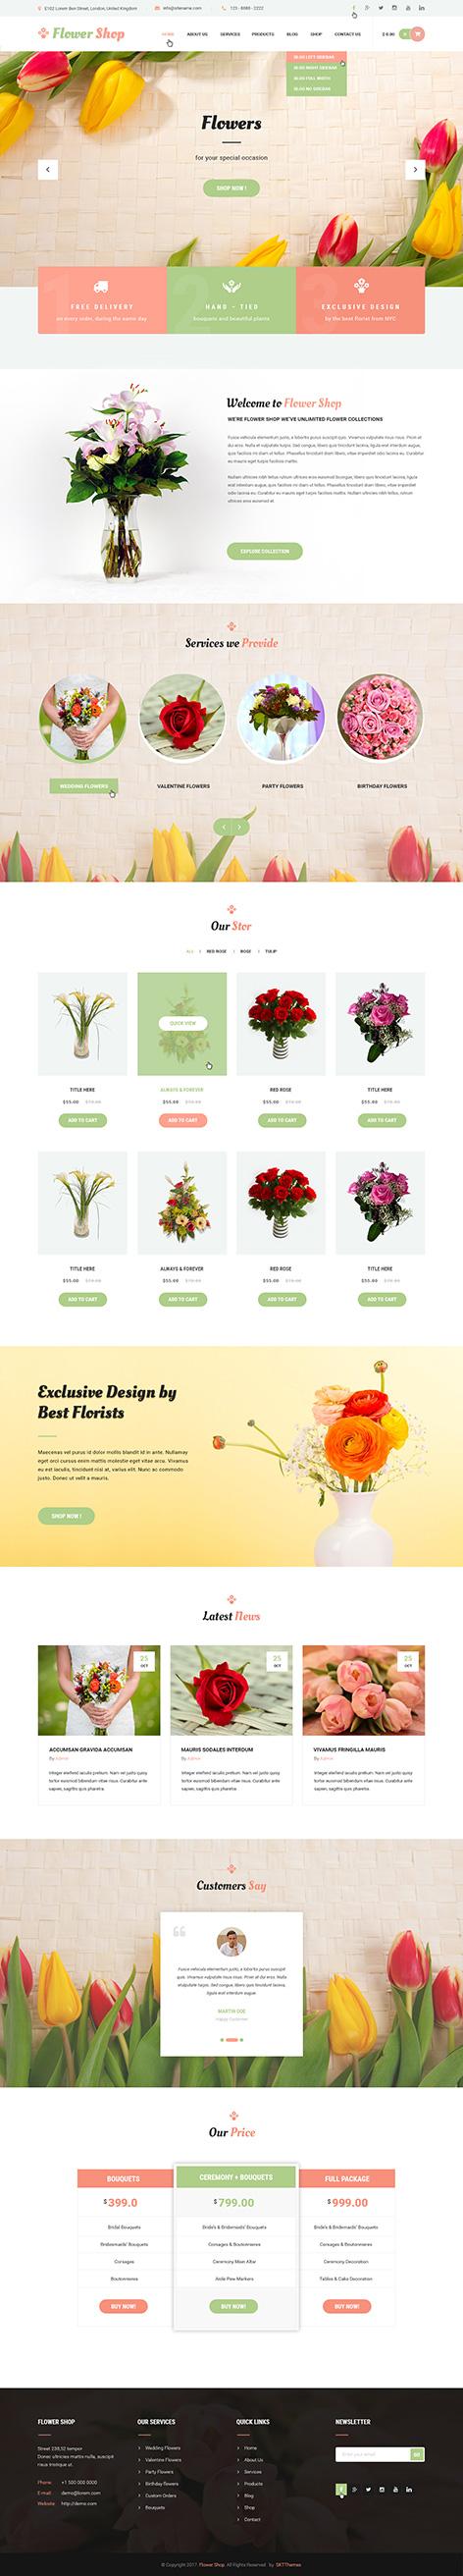 flower shop wordpress theme1 - Flower Shop